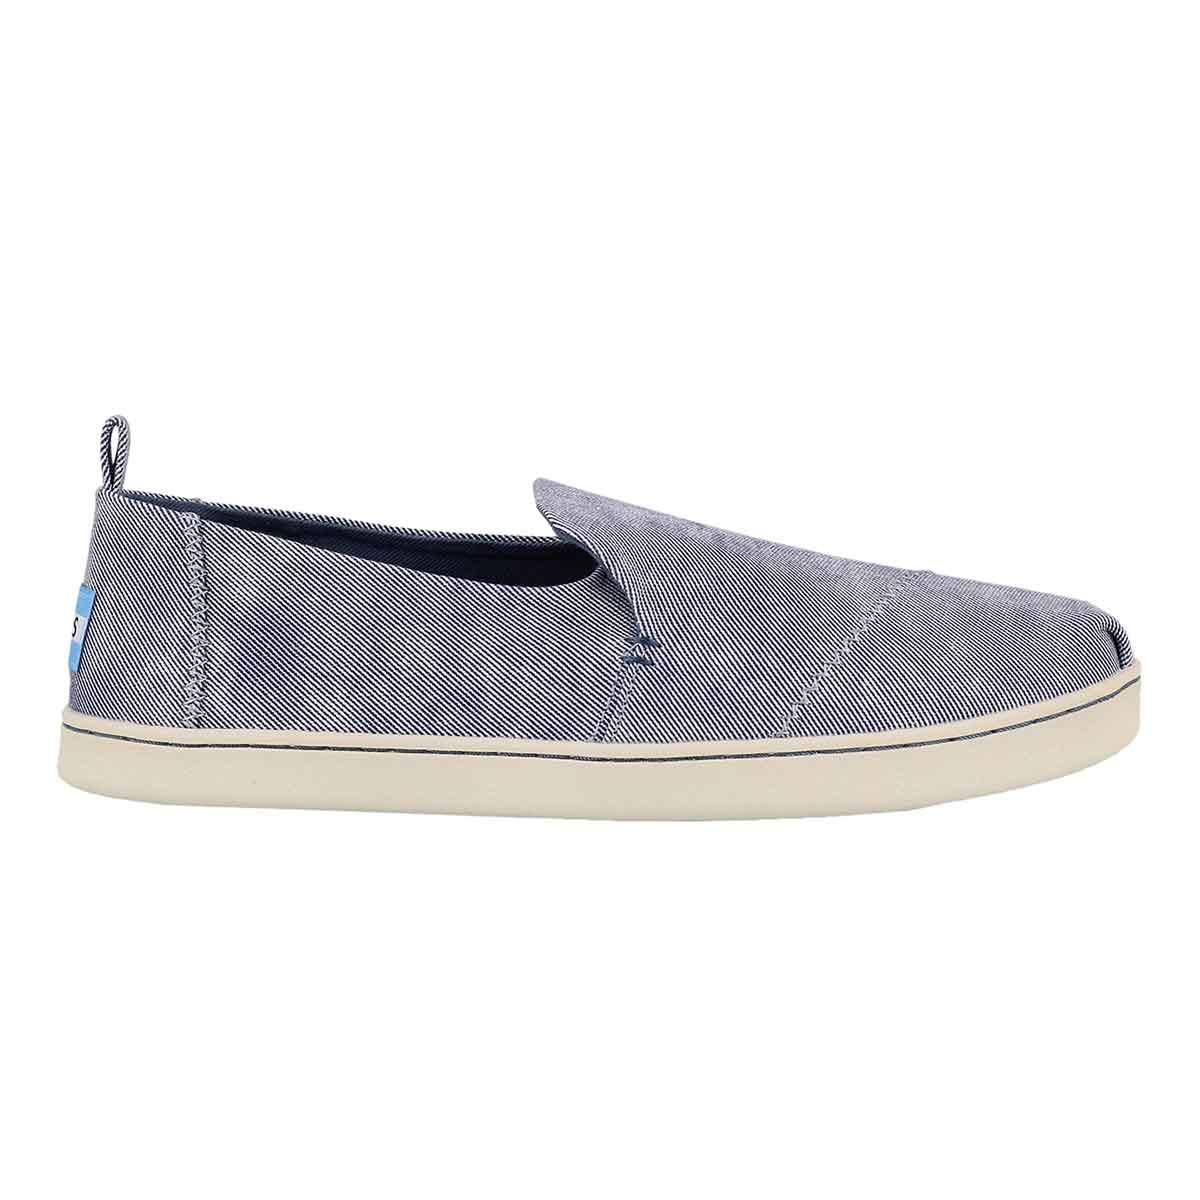 Lds Deconstructed Alpargata blue loafer